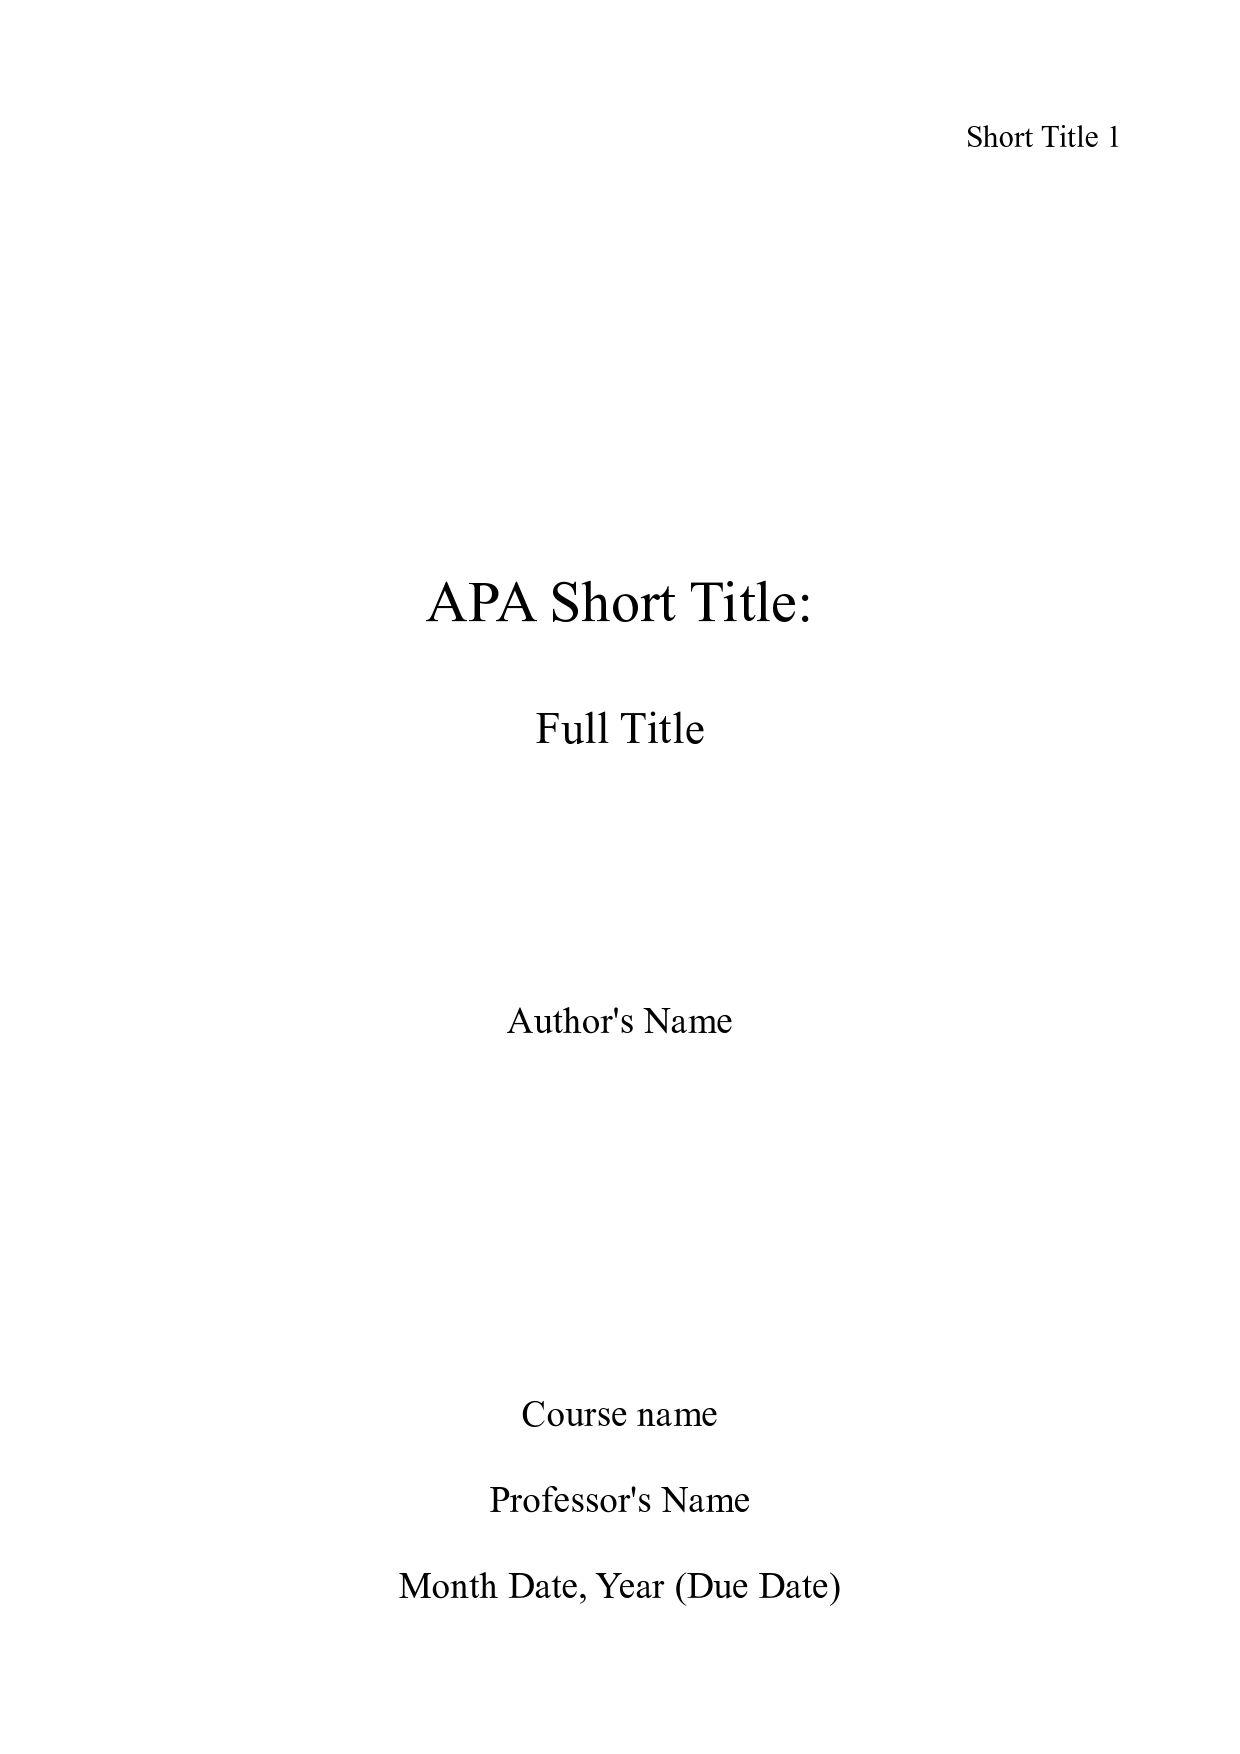 001 Essay Cover Page Apa Example Impressive Correct Title Proper Format Full